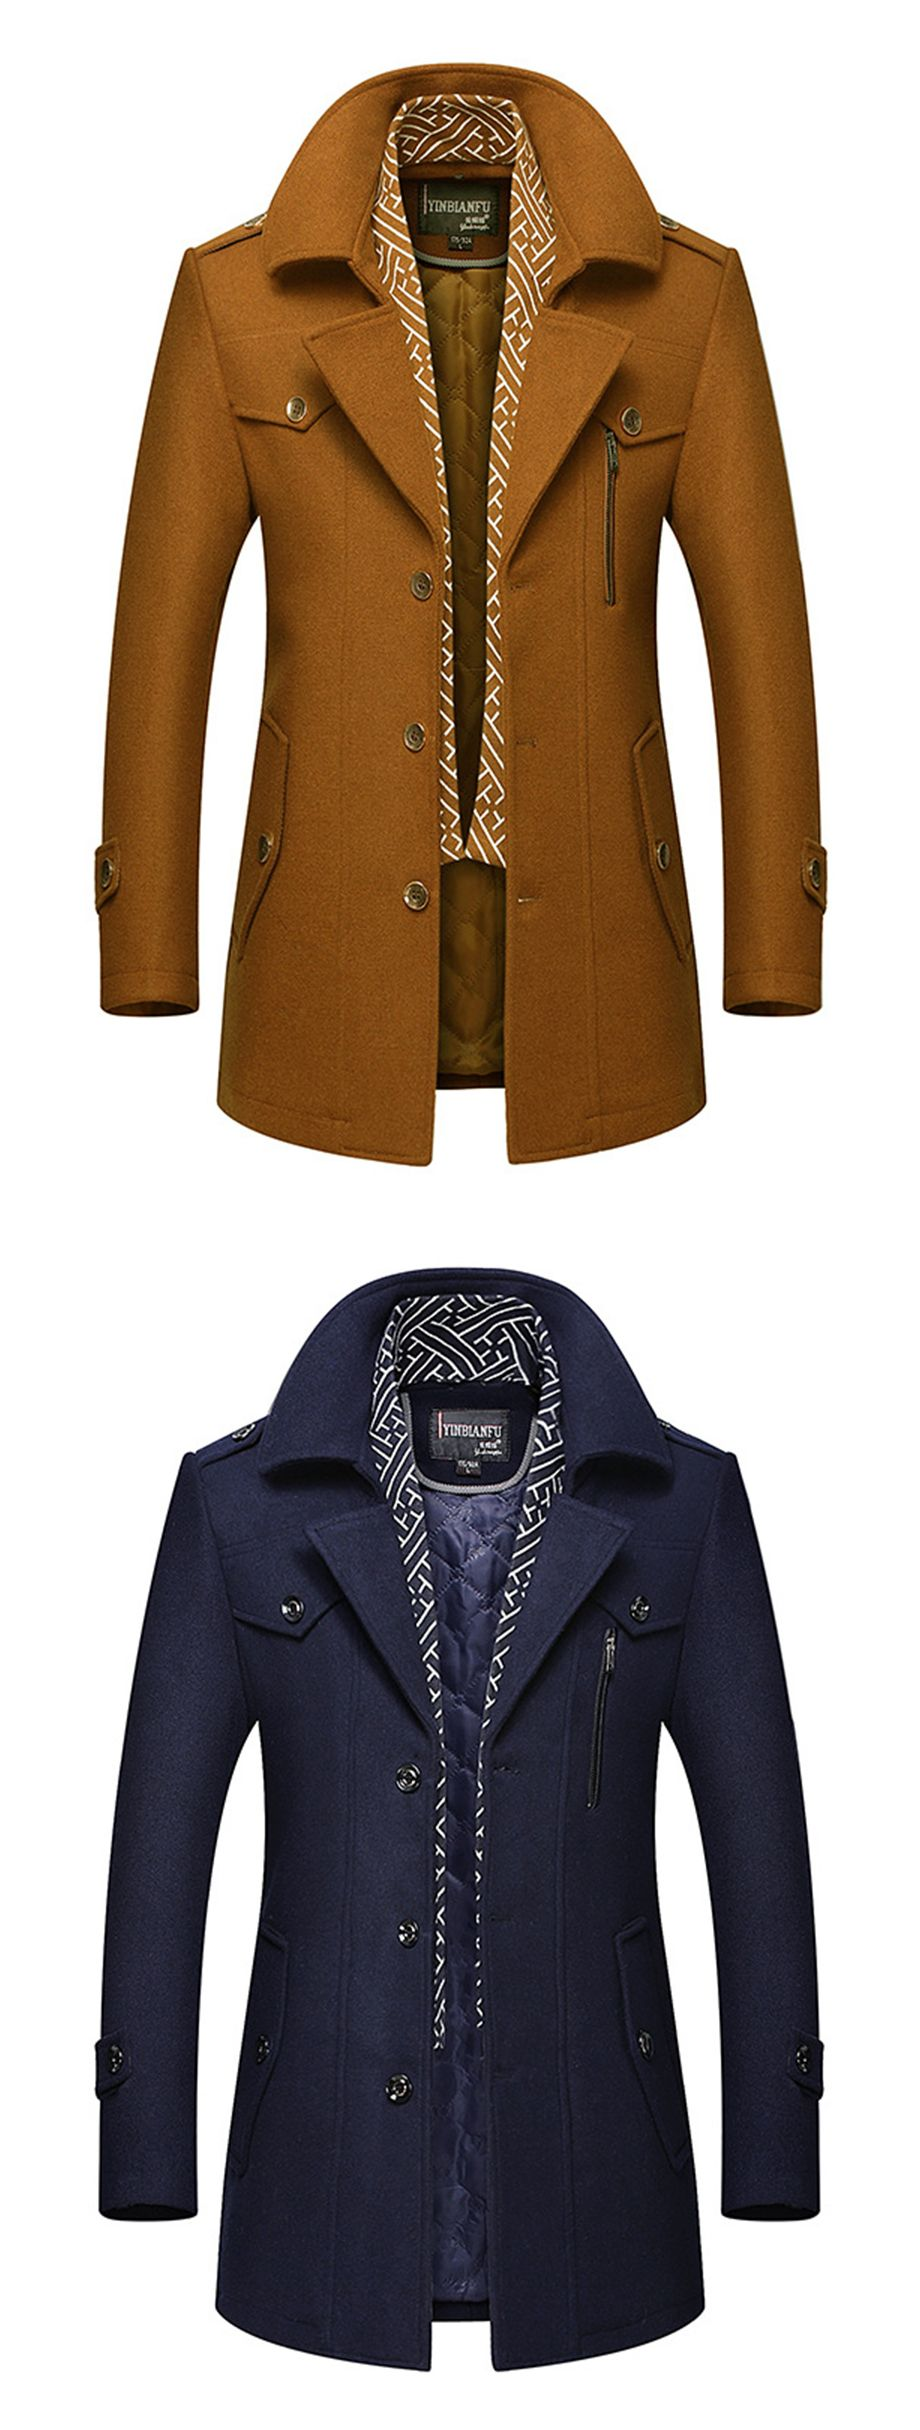 84483ab4c Material:Wool Blends; Length:Mid-Length; Sleeve Length:Long Sleeve #men 'sfashion